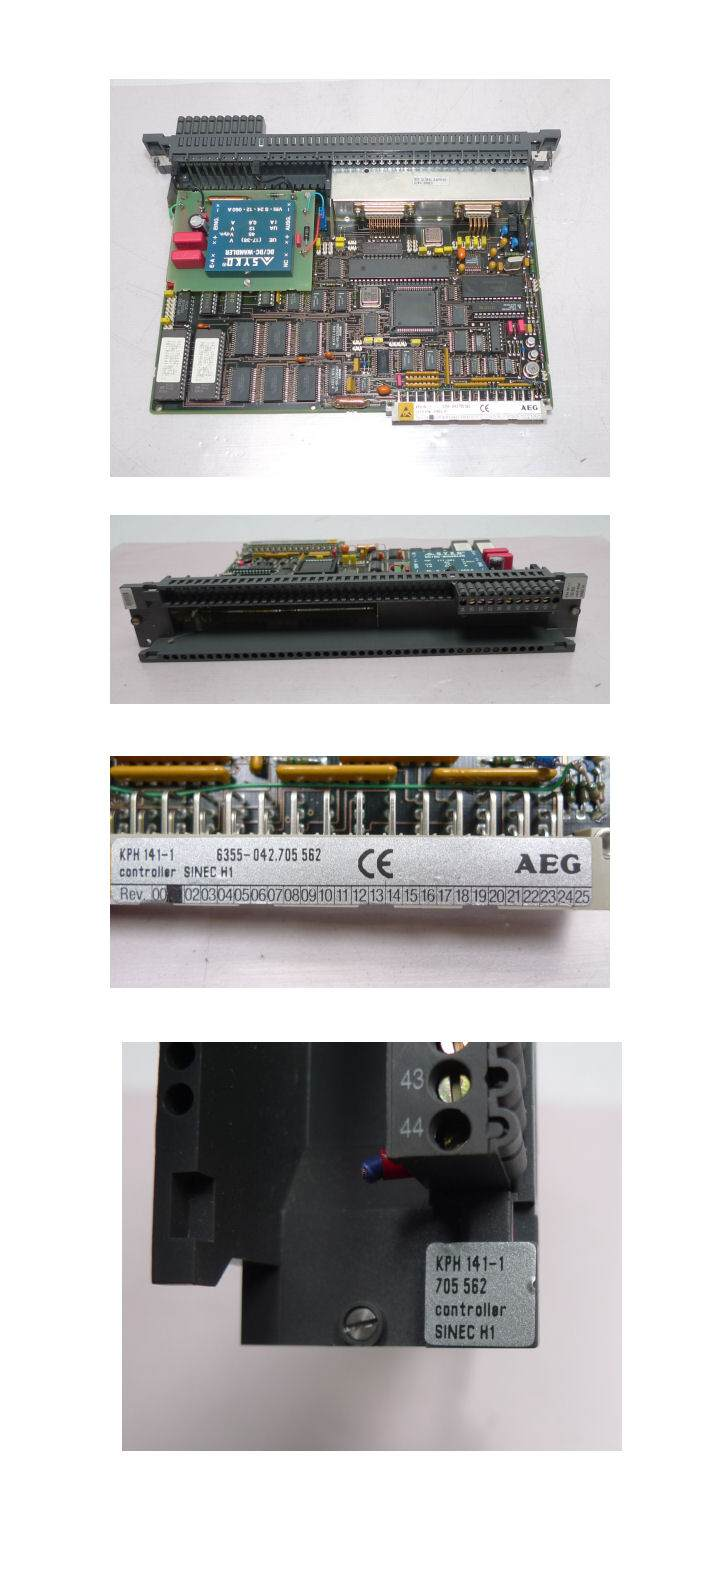 AEG KPH-141-1 6355-042.705562